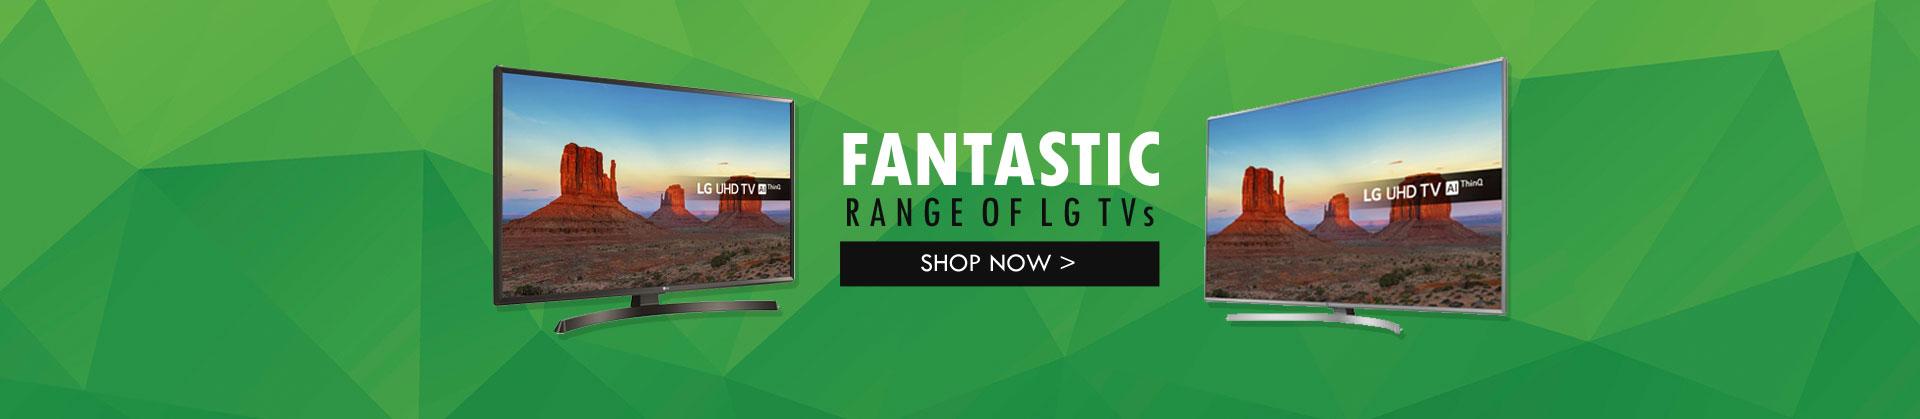 Fantastic Range of LG TVs